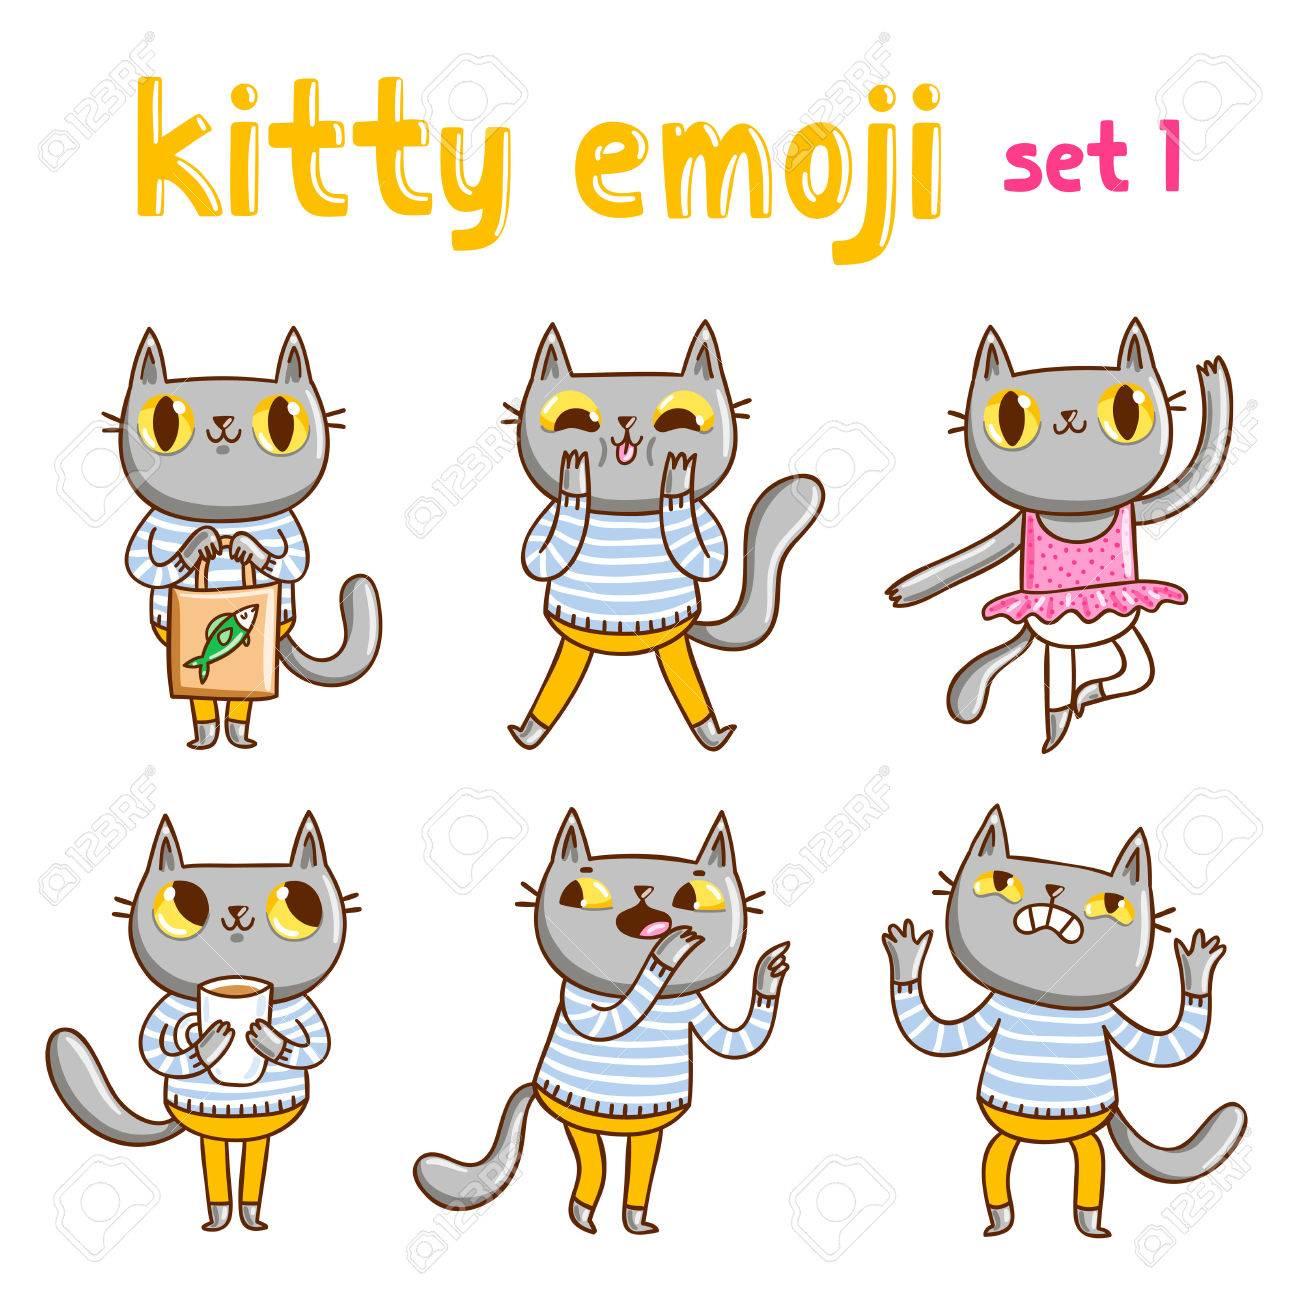 Kitty Emoji Set 1. Vector Mascot Illustrations Royalty Free Cliparts ... 17ddc91f98f0